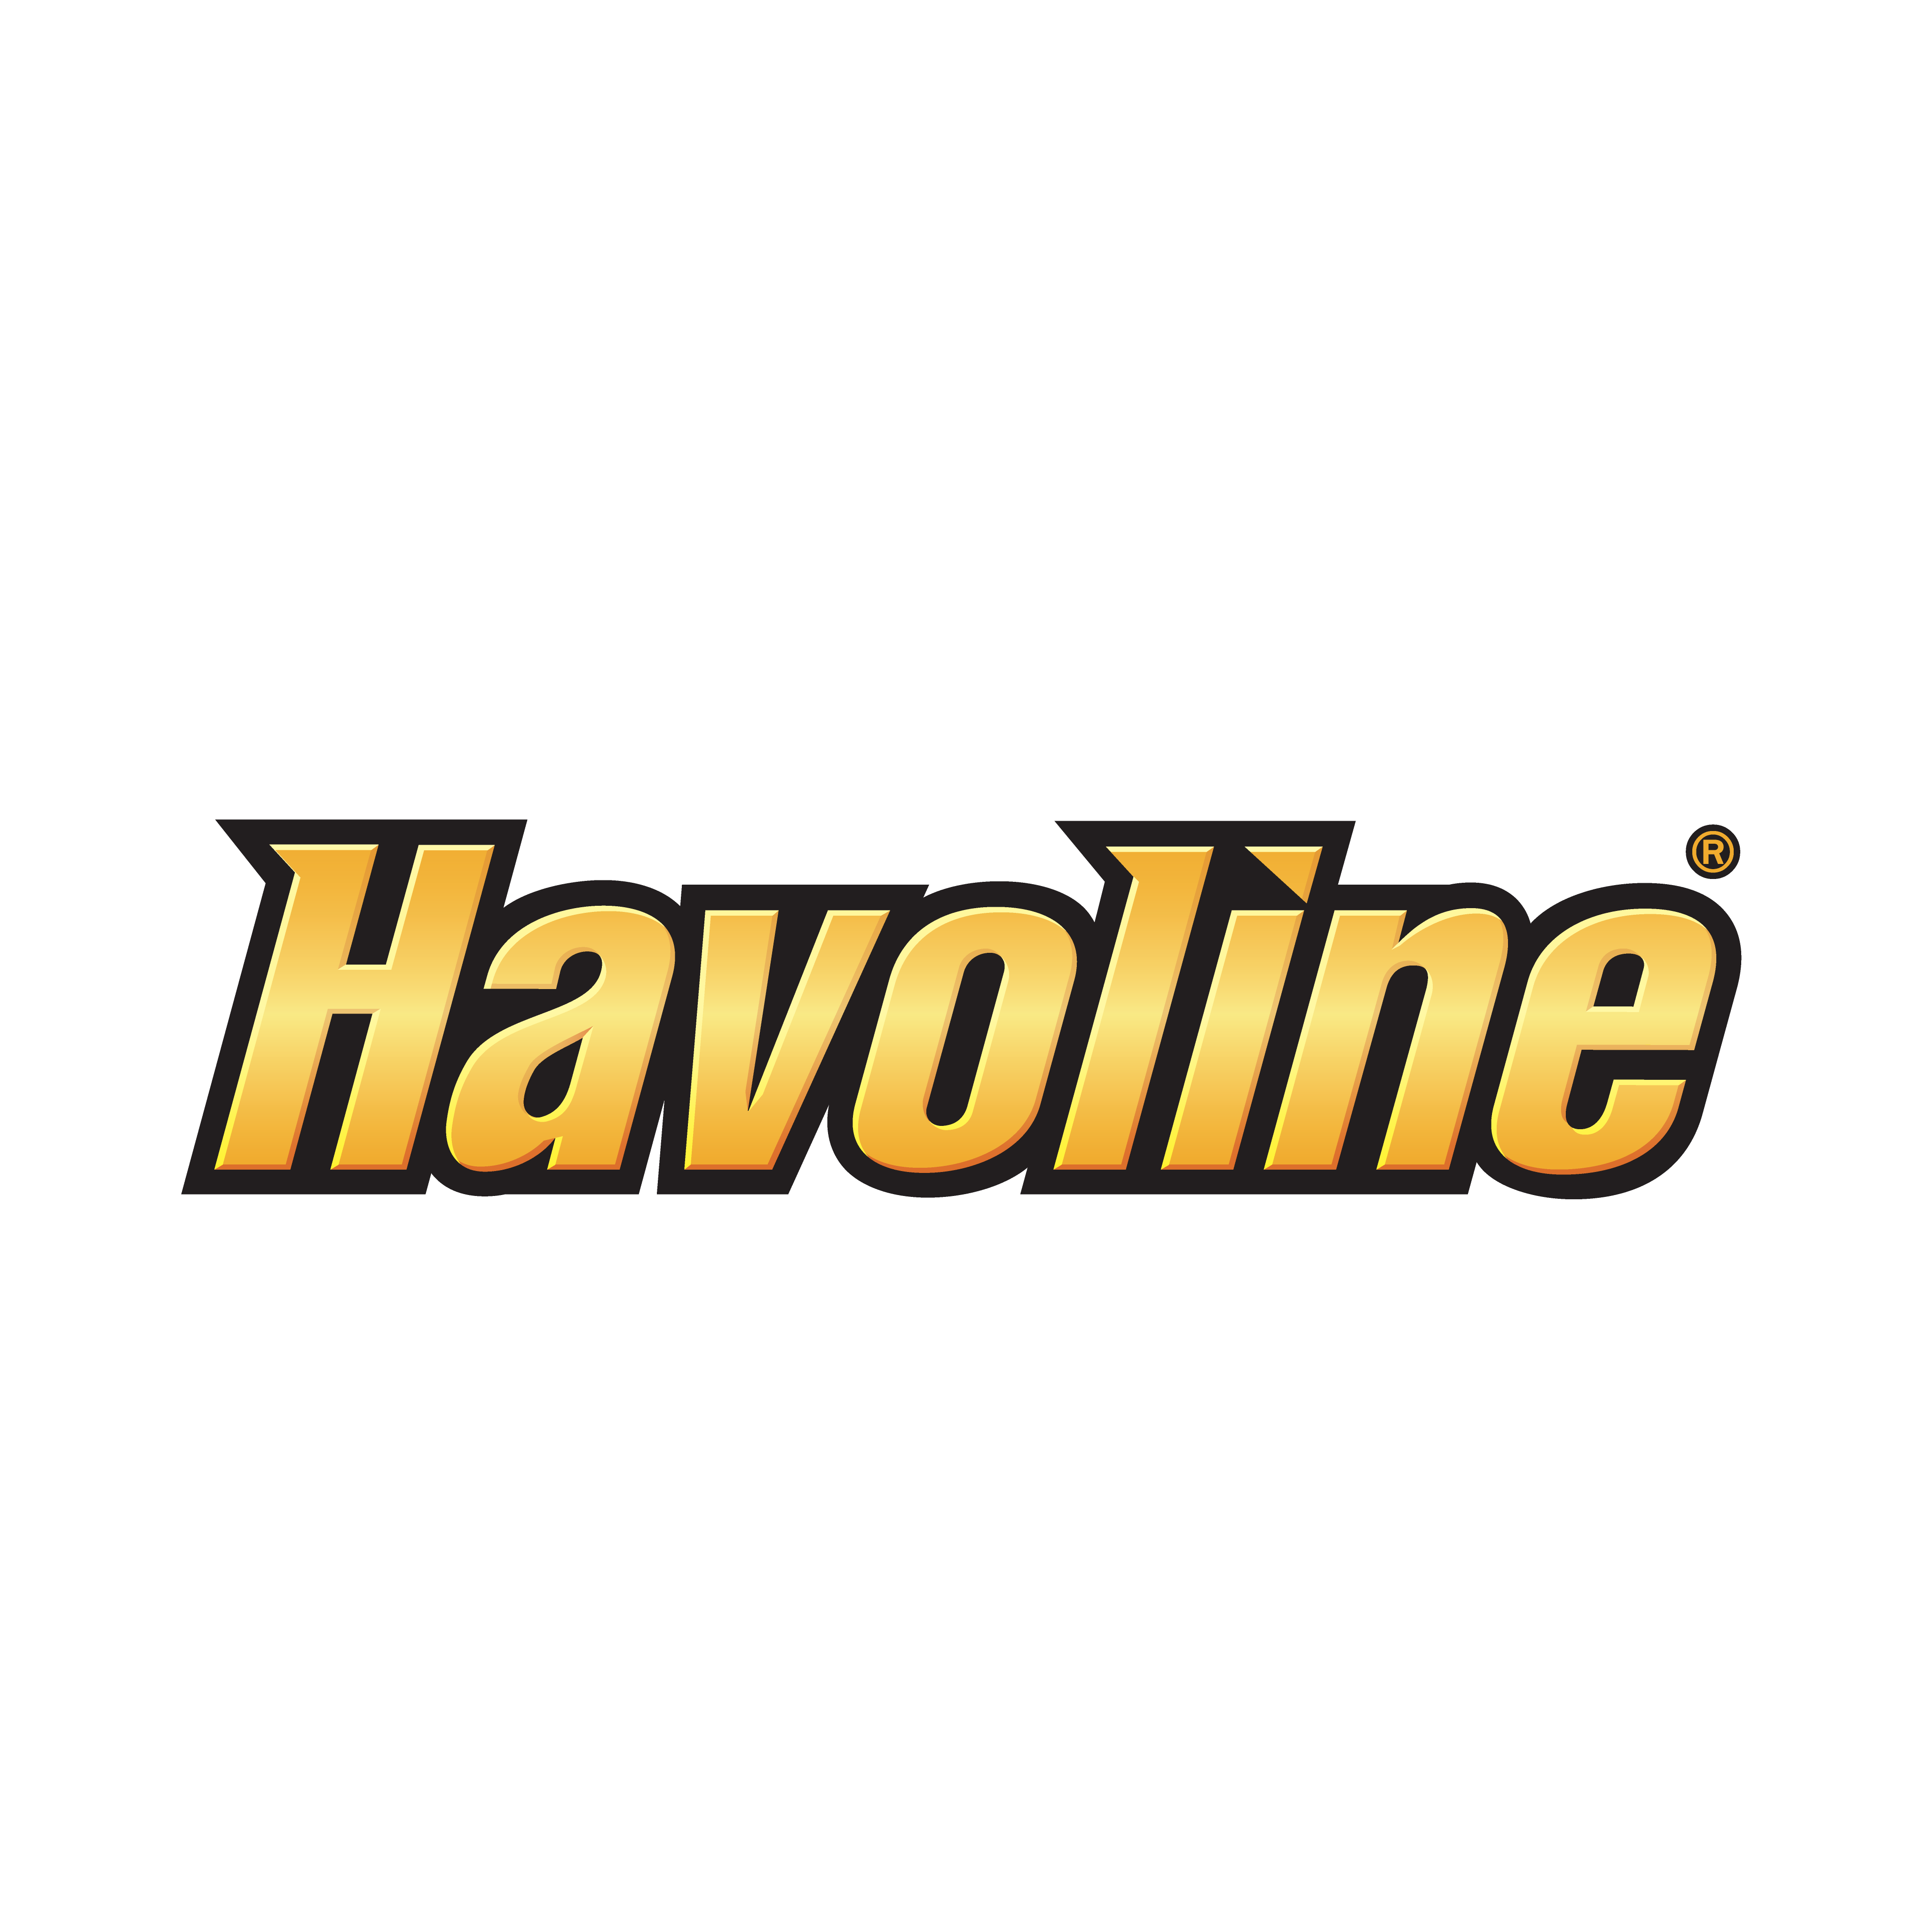 havoline logo 0 - Havoline Logo